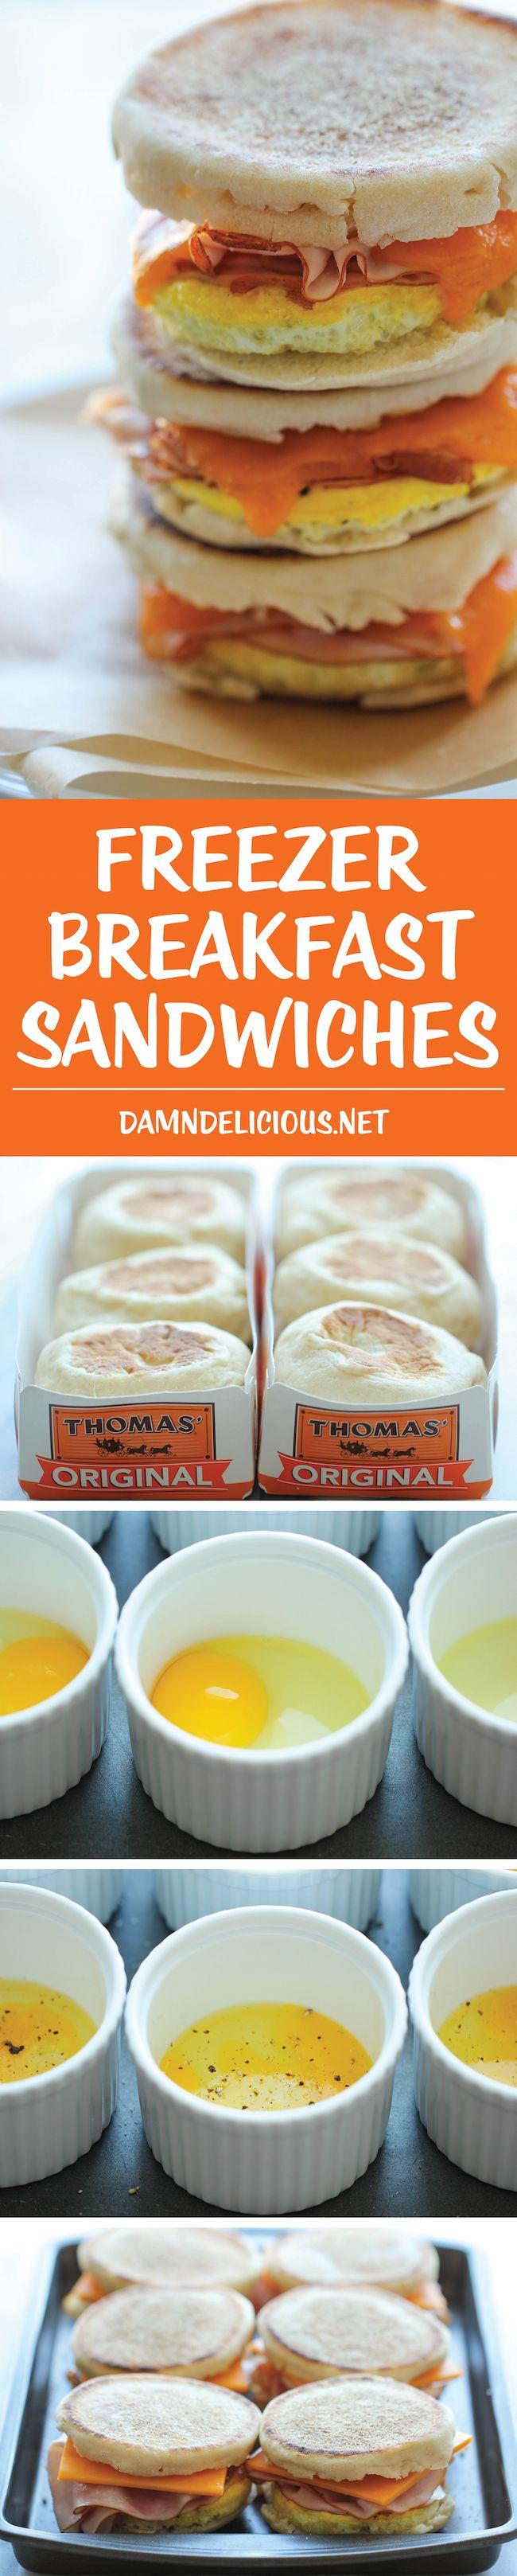 Freezer Breakfast Sandwiches - Easy, make-ahead freezer-friendly sandwiches…